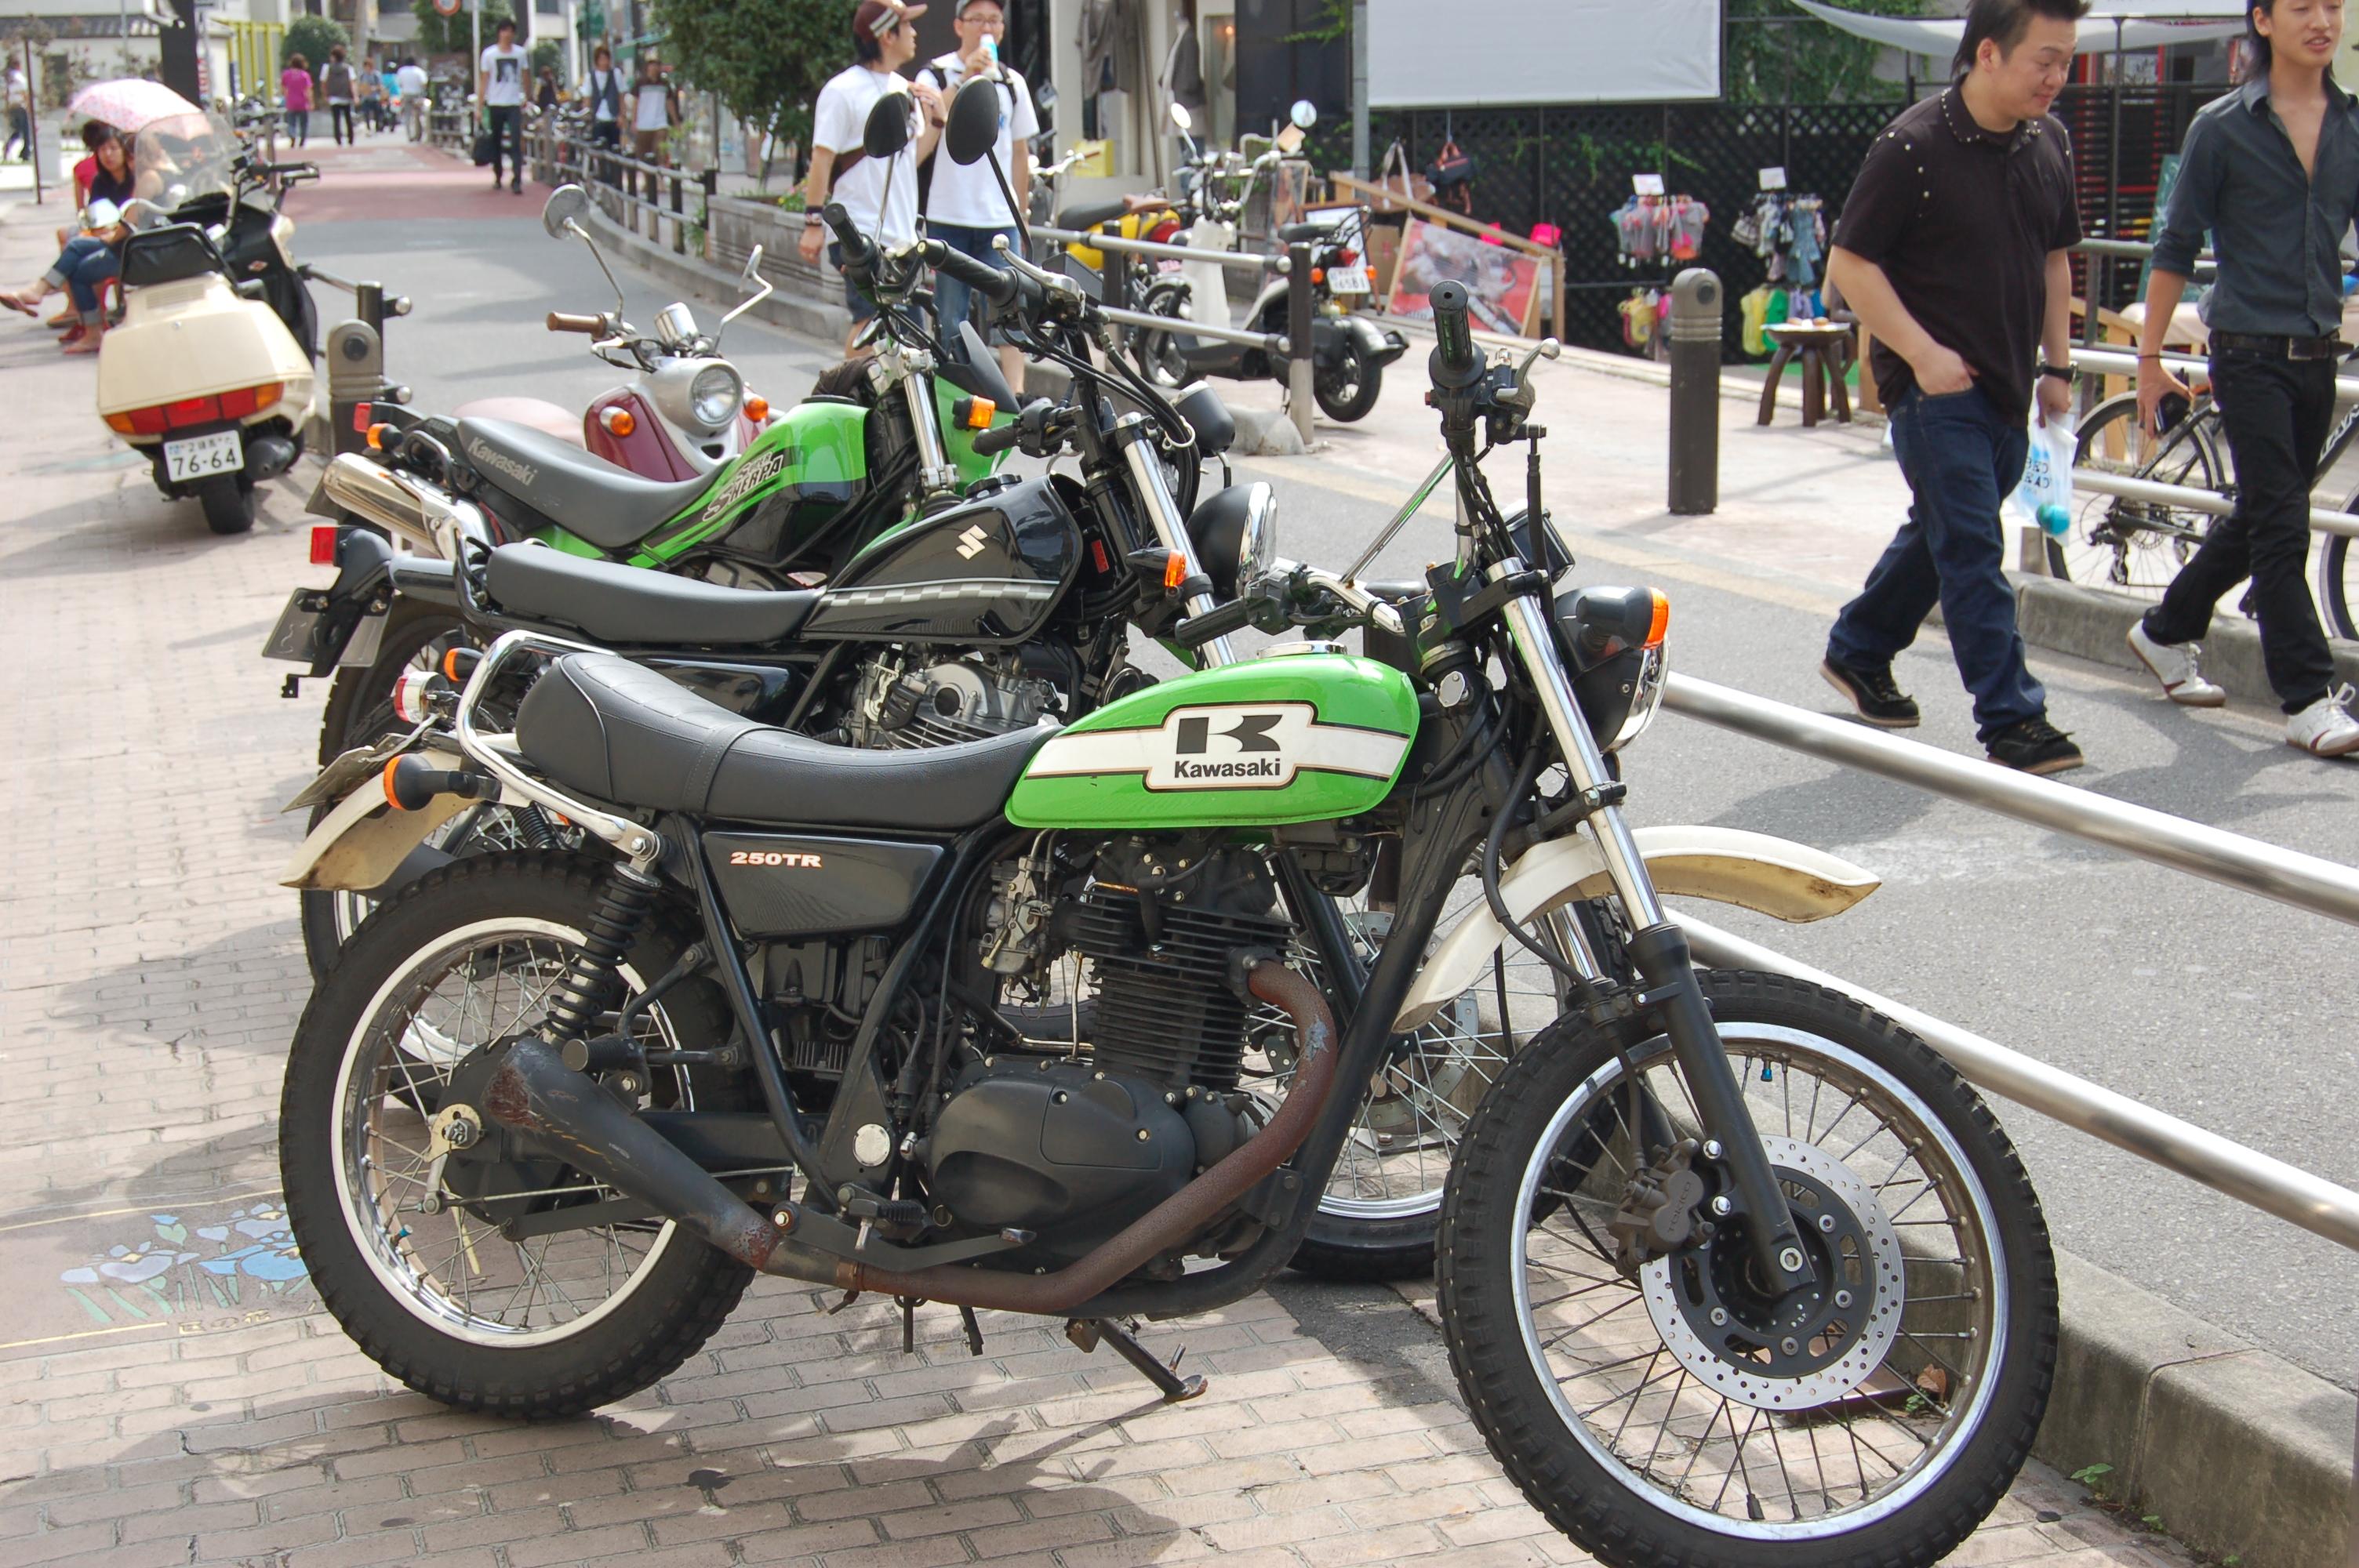 File:Kawasaki 250TR 01.jpg - Wikimedia Commons